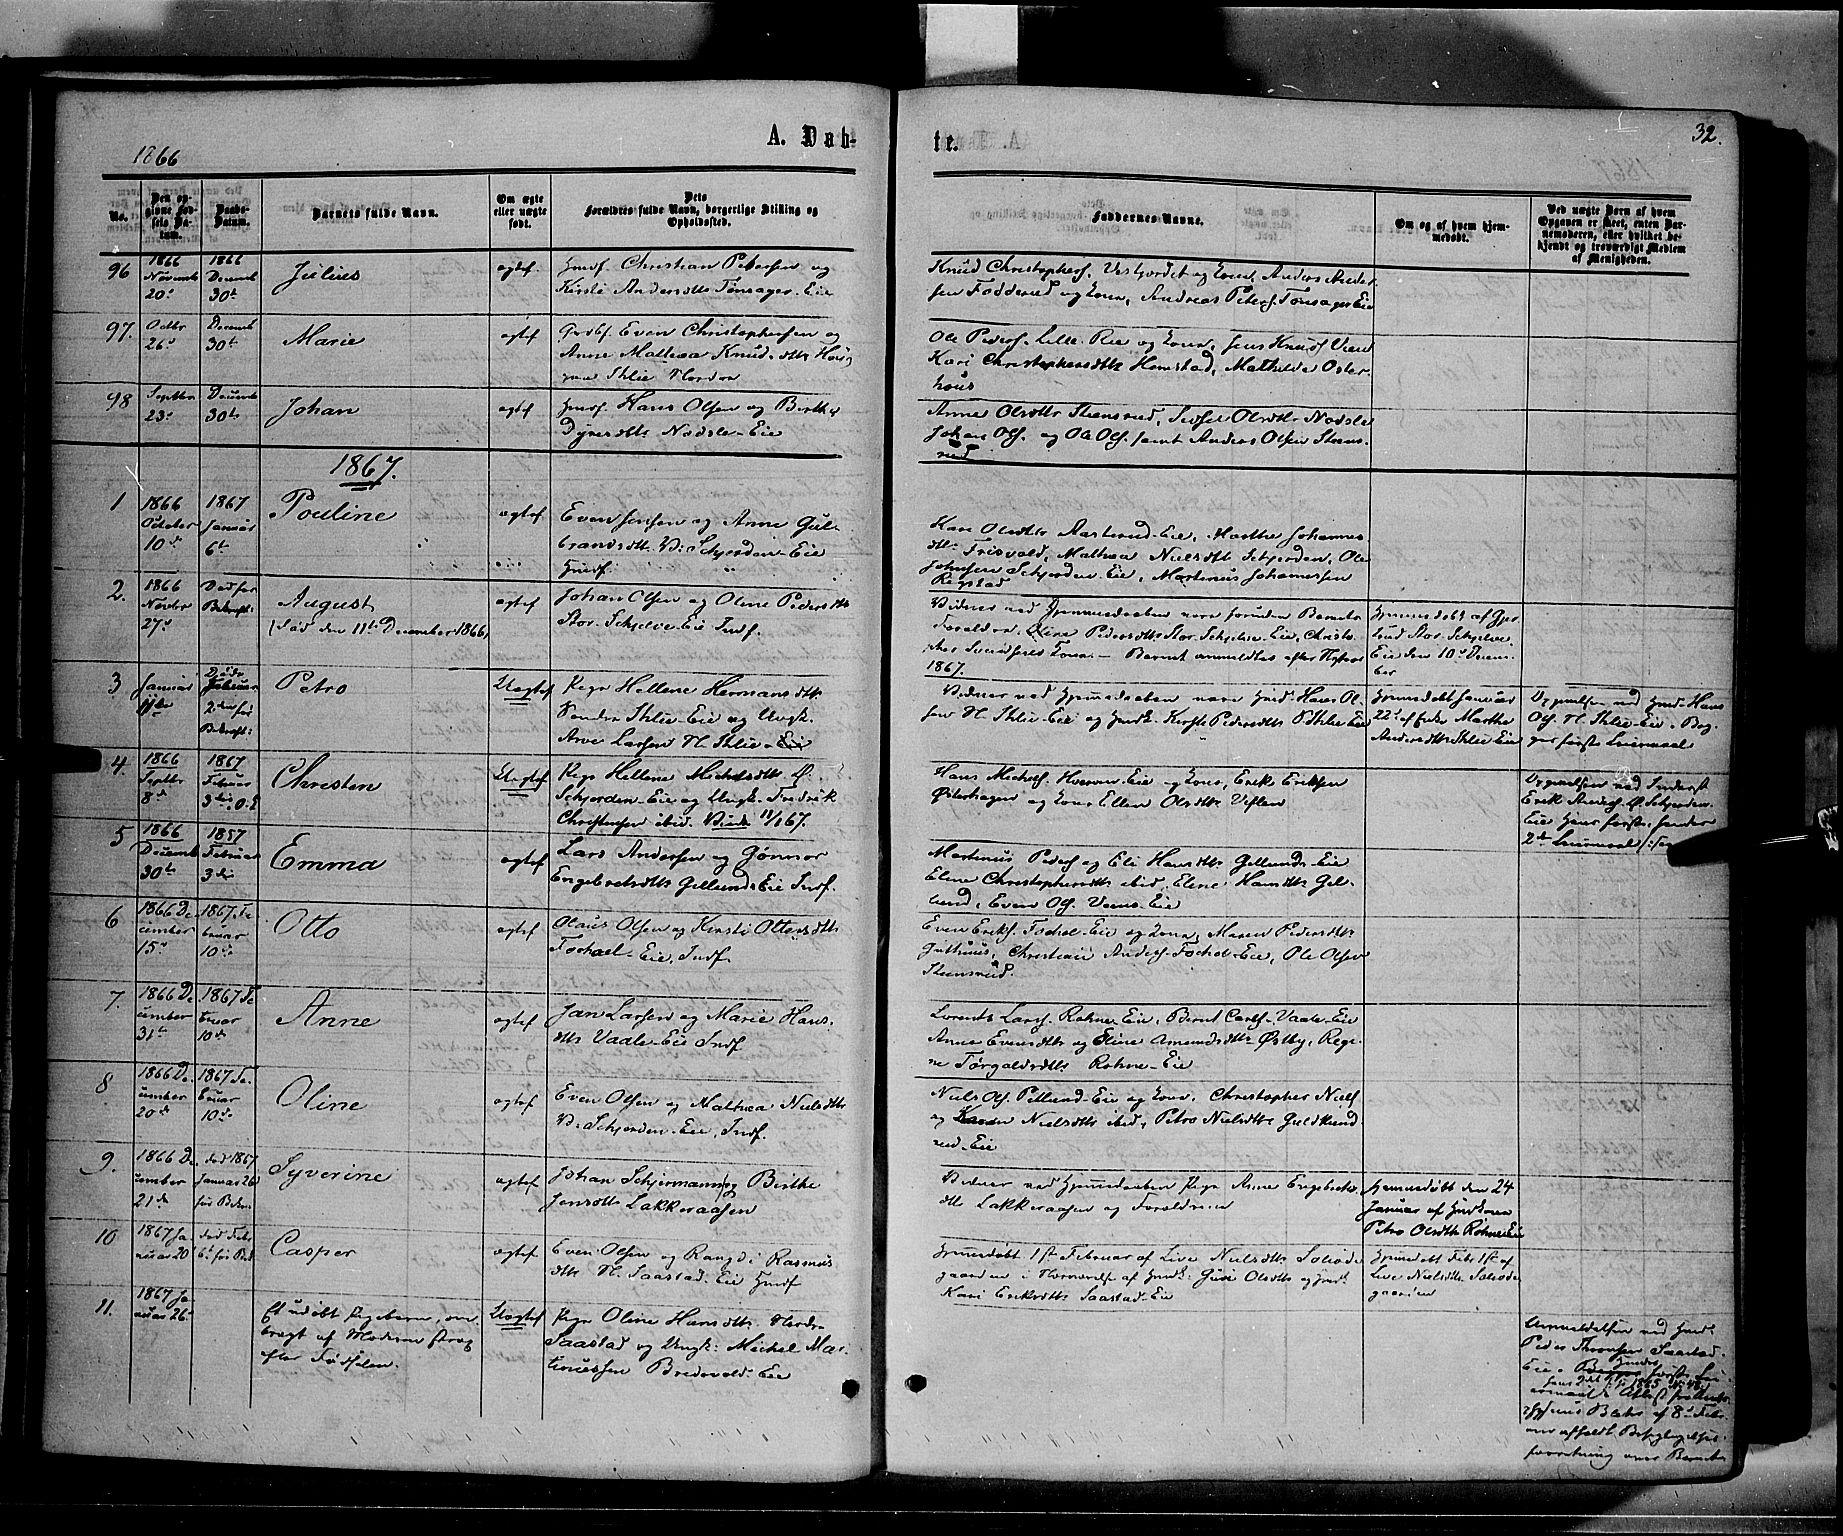 SAH, Stange prestekontor, K/L0013: Ministerialbok nr. 13, 1862-1879, s. 32